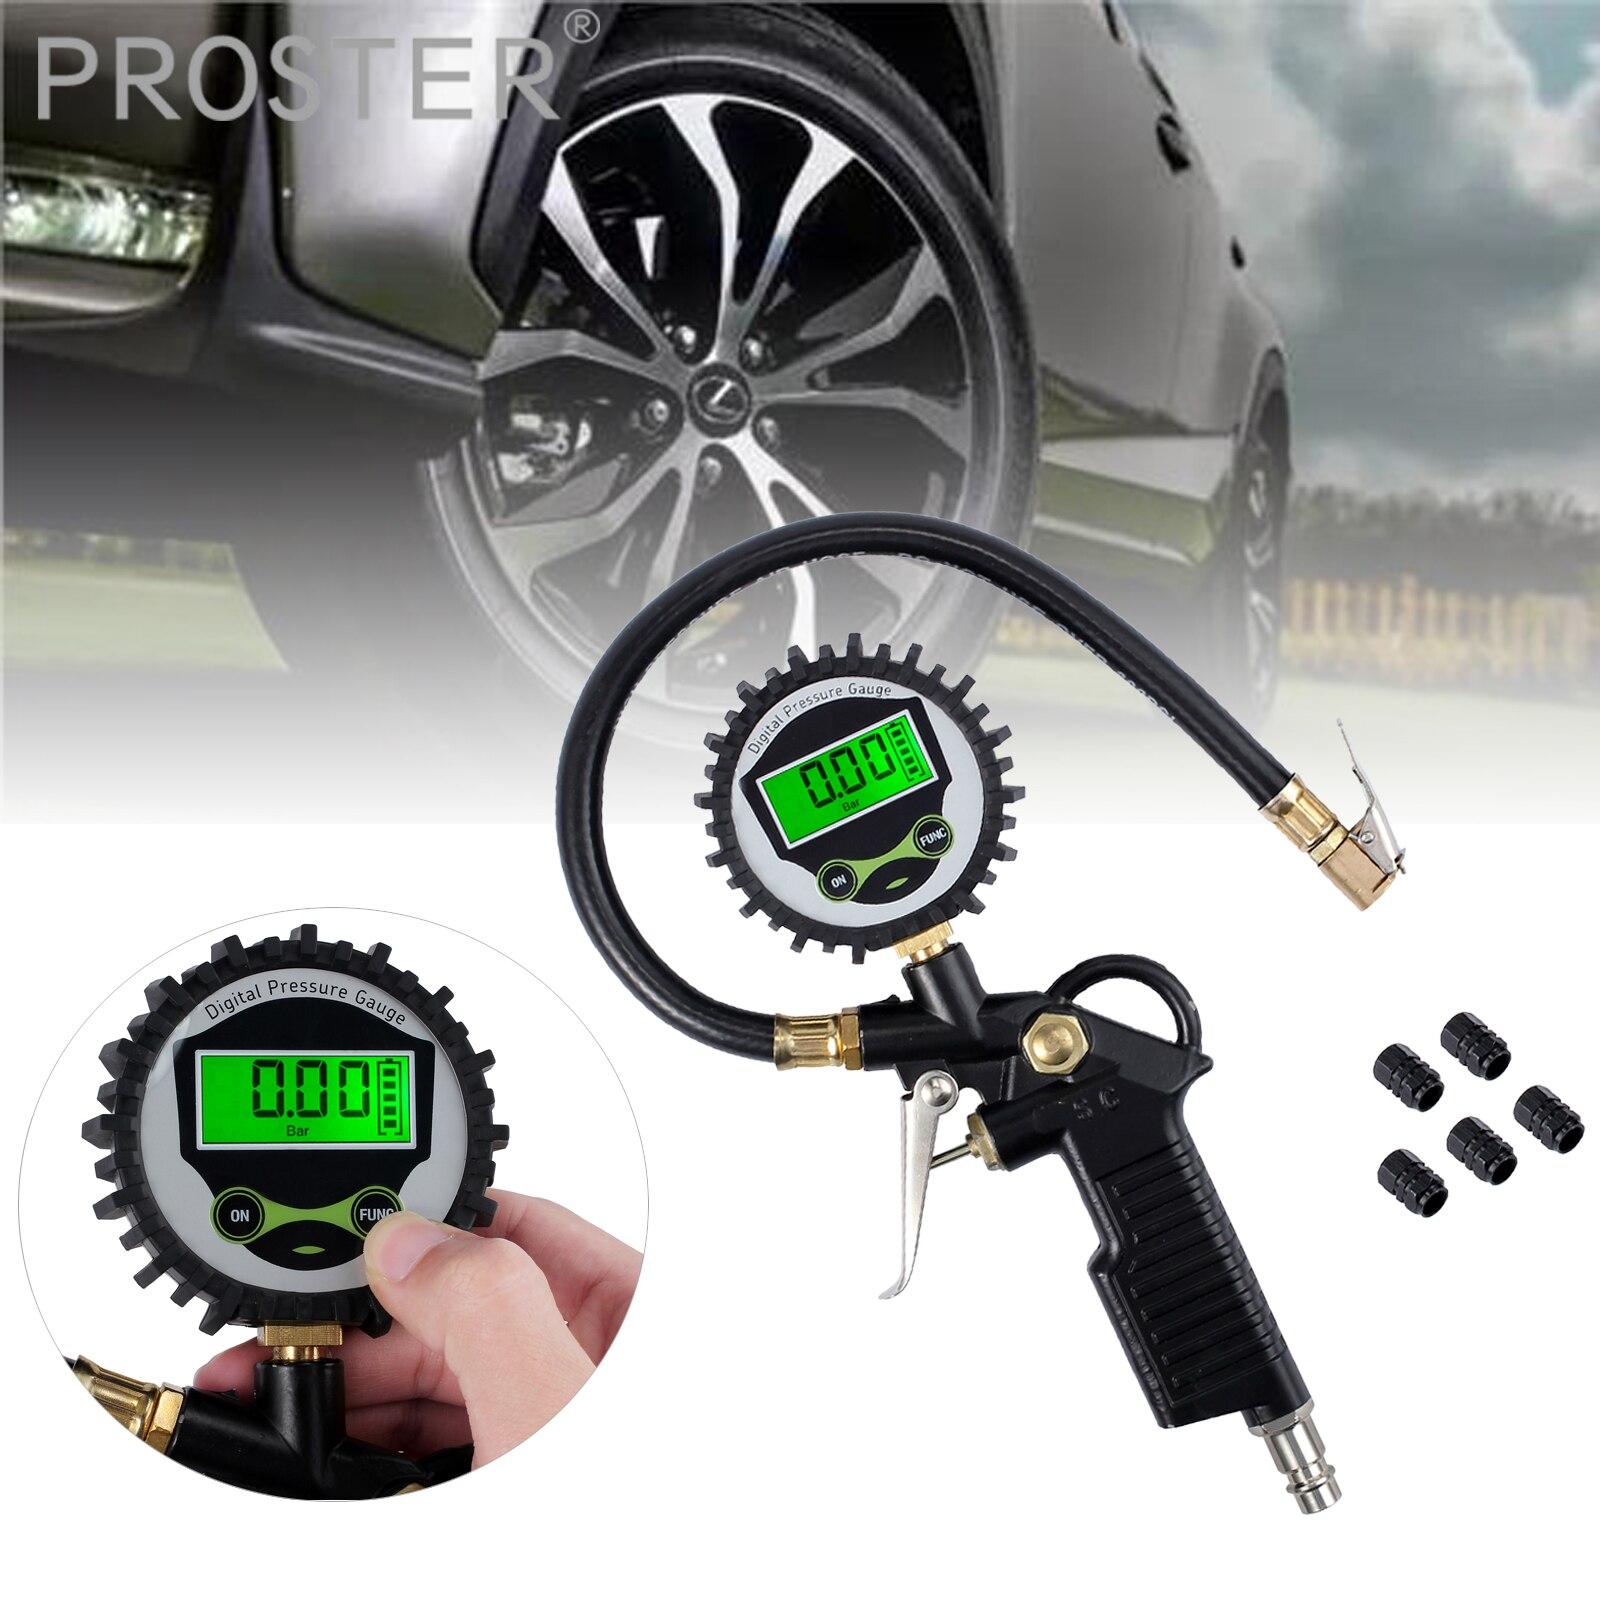 Proster For Digital Tire Pressure Gauge Tire Inflator Gauge 200 PSI With 5 Black Valve Caps Vehicle Tester Inflation Monitoring